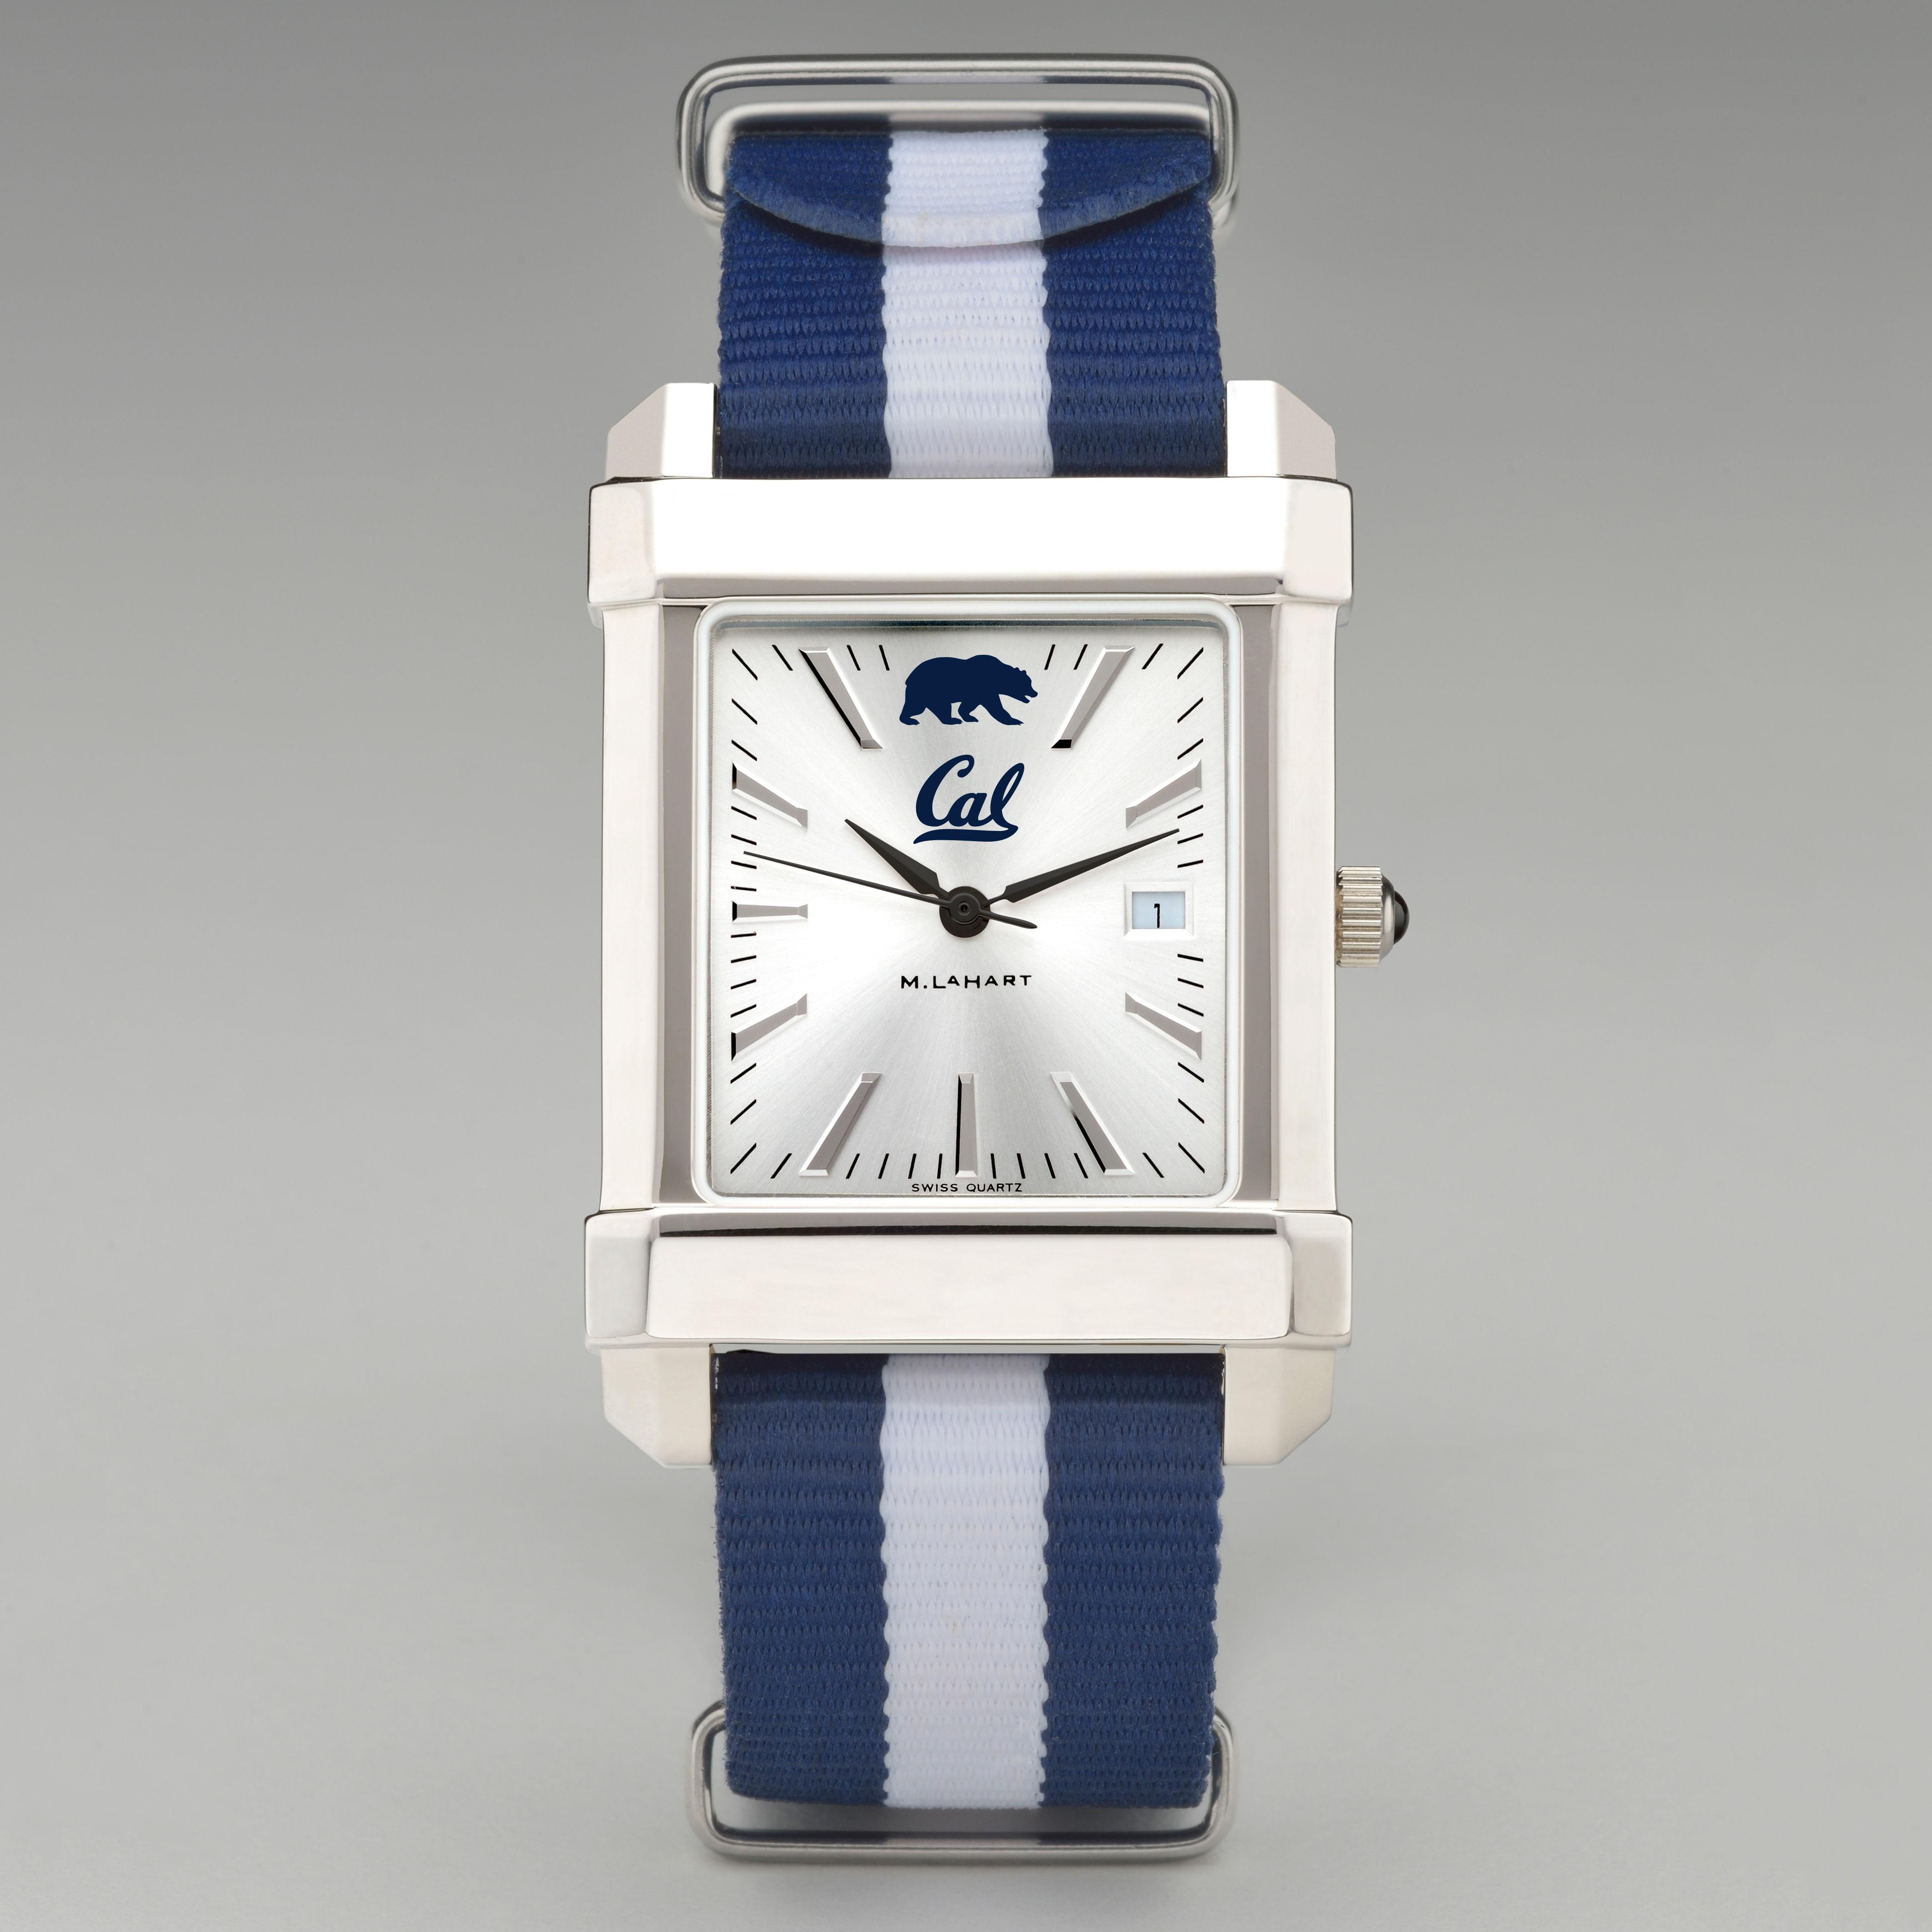 Berkeley Men's Collegiate Watch w/ NATO Strap